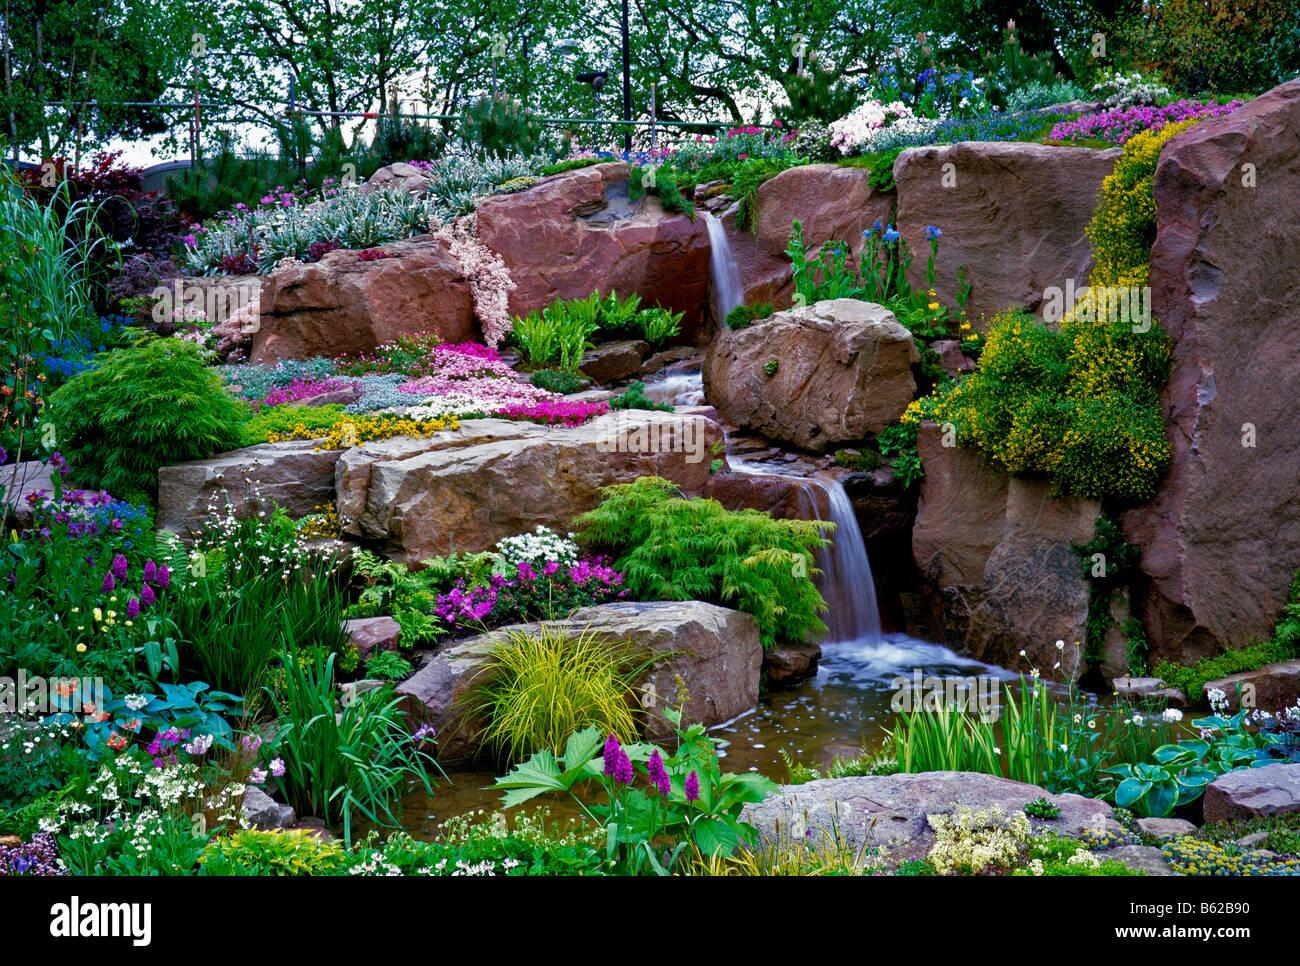 Colorful Alpine water garden in summer - Stock Image